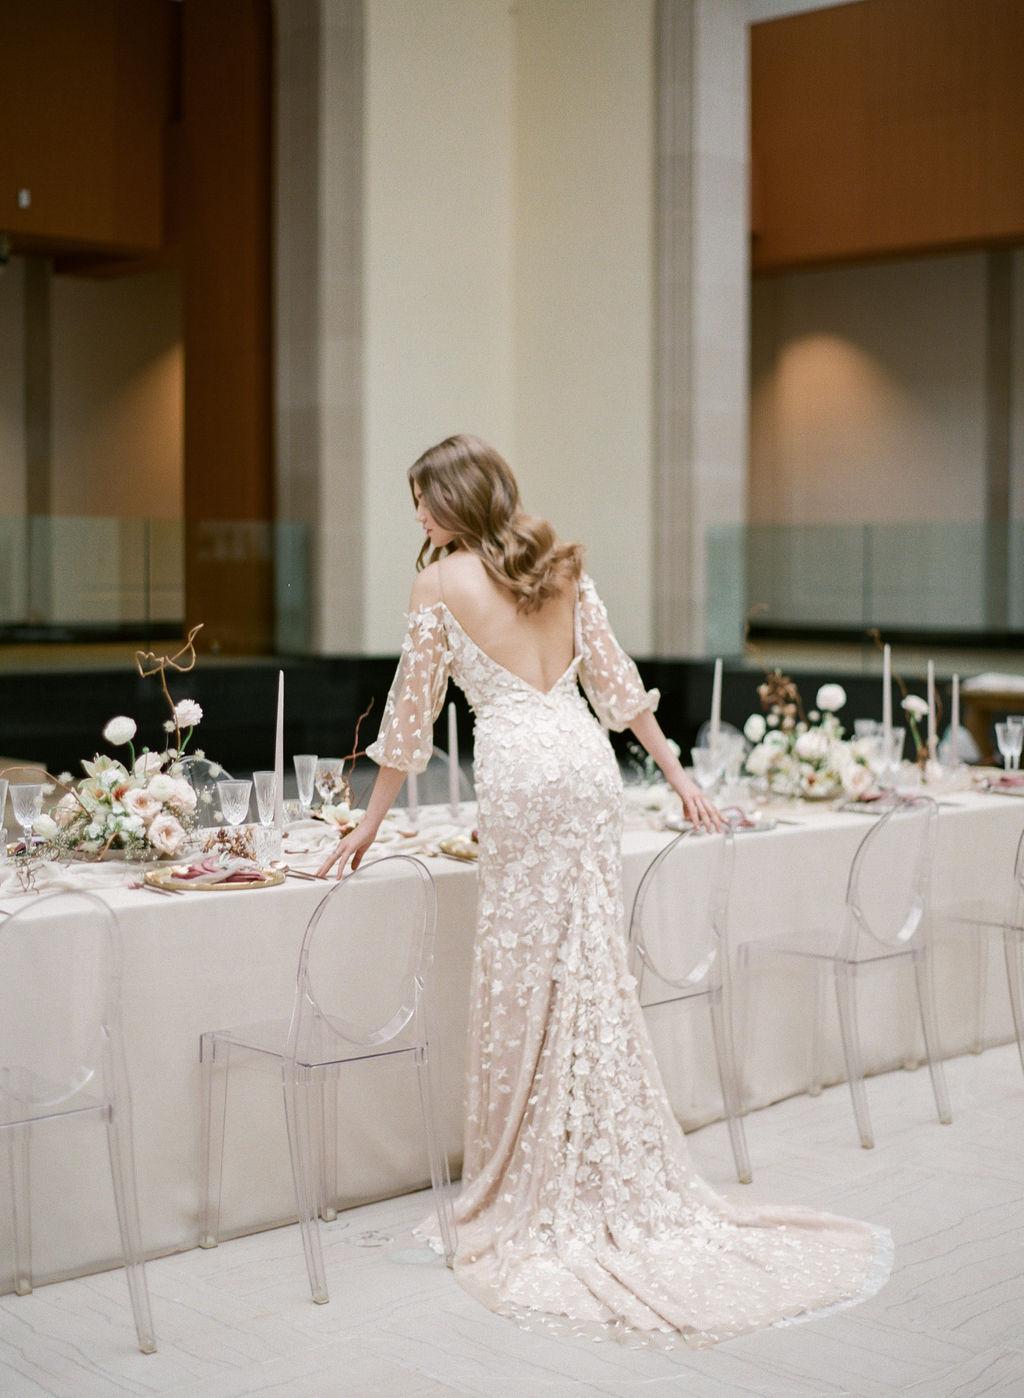 artiese-ago-wedding-editorial-000423710006.jpg